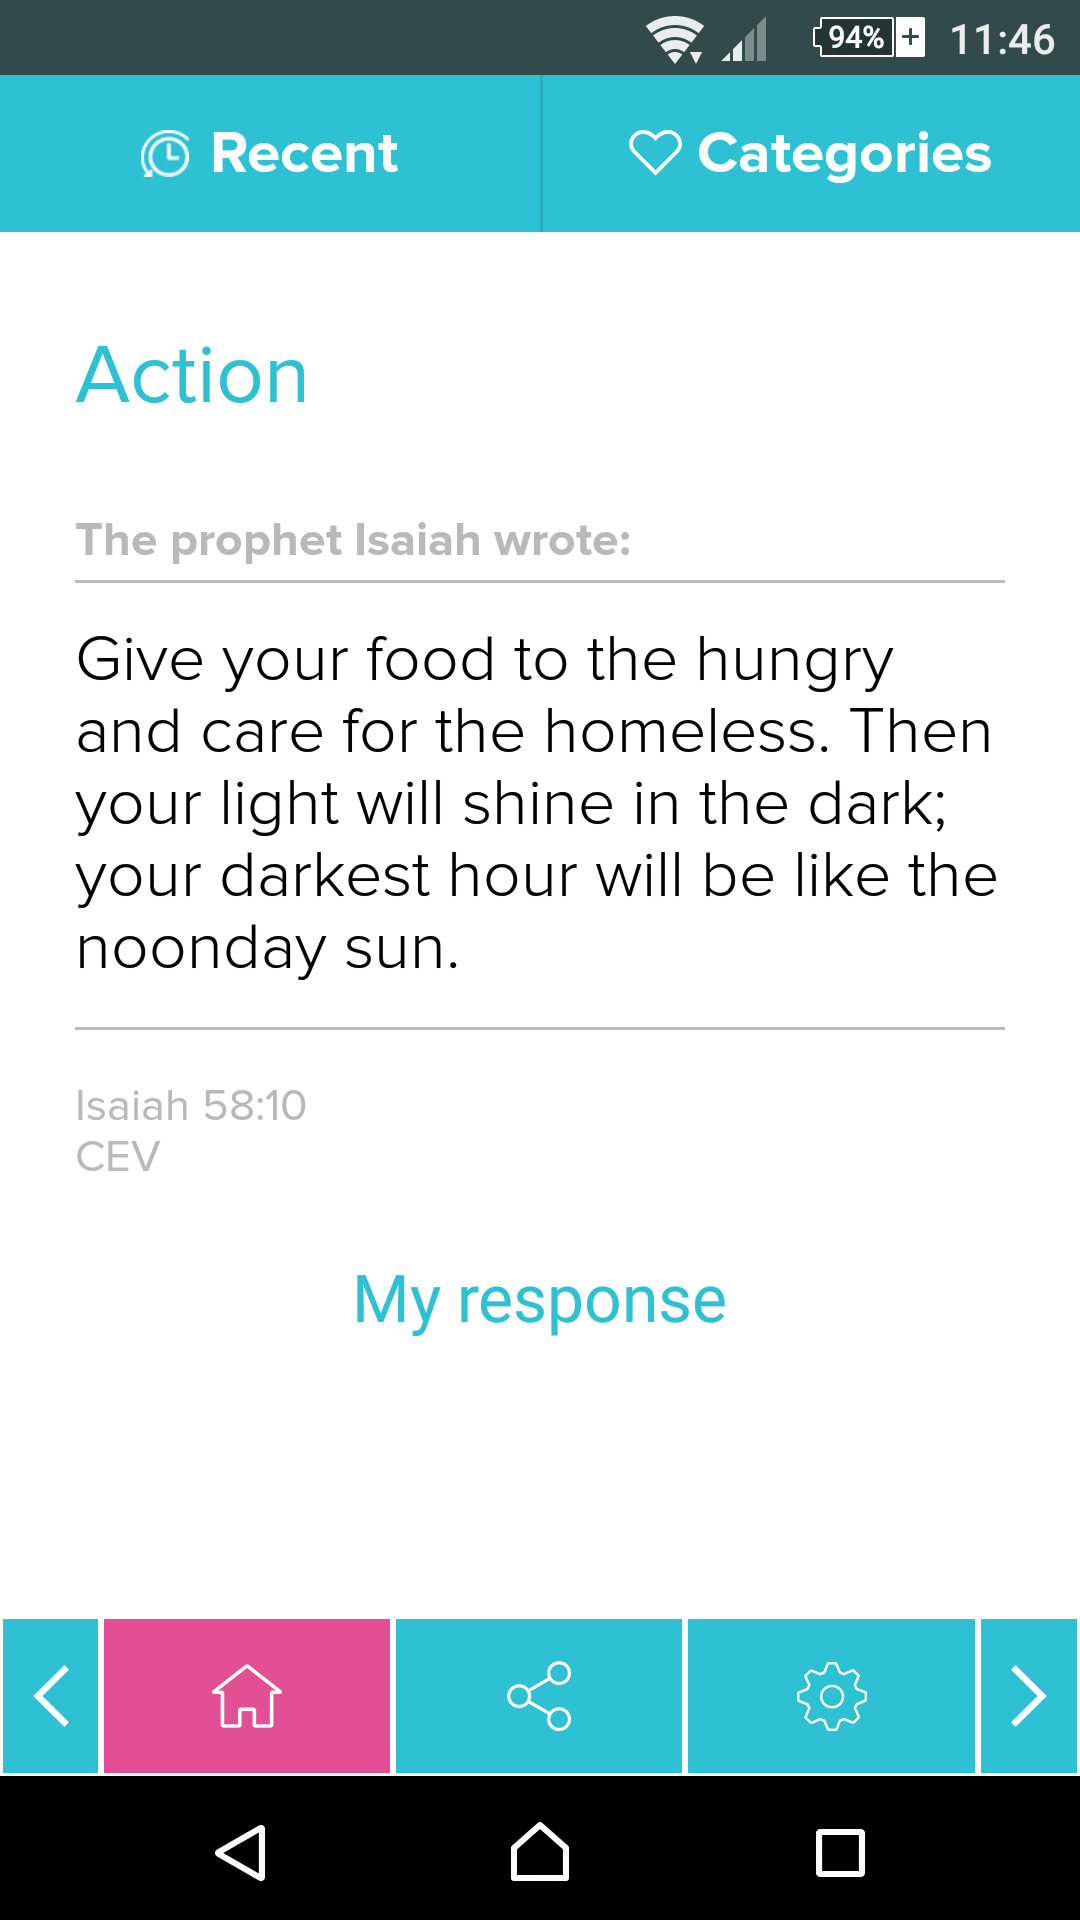 lcwords-app-screenshot.png